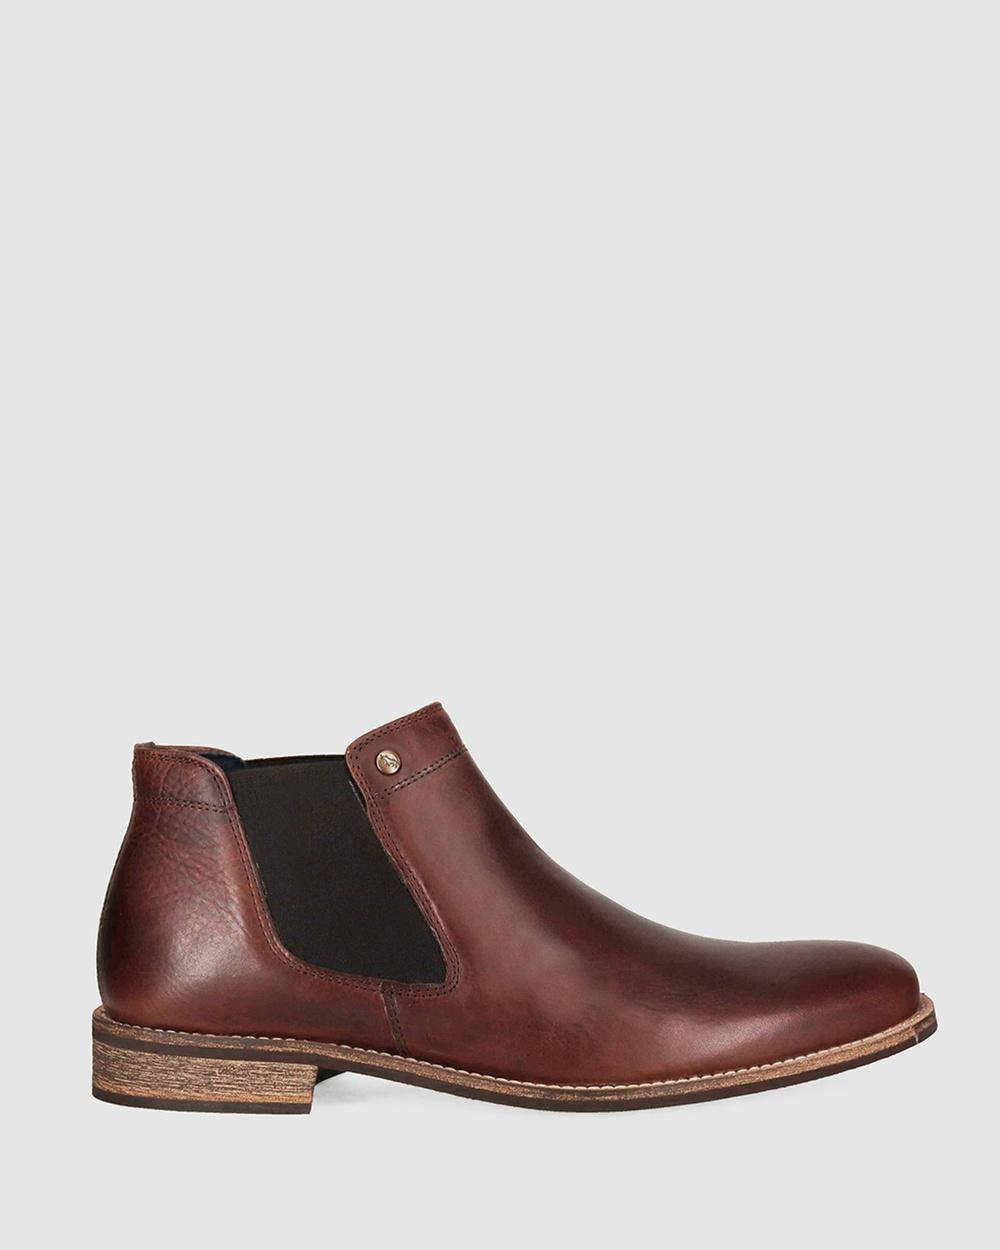 Wild Rhino Drake Chelsea Boots Casual Shoes Brown Australia